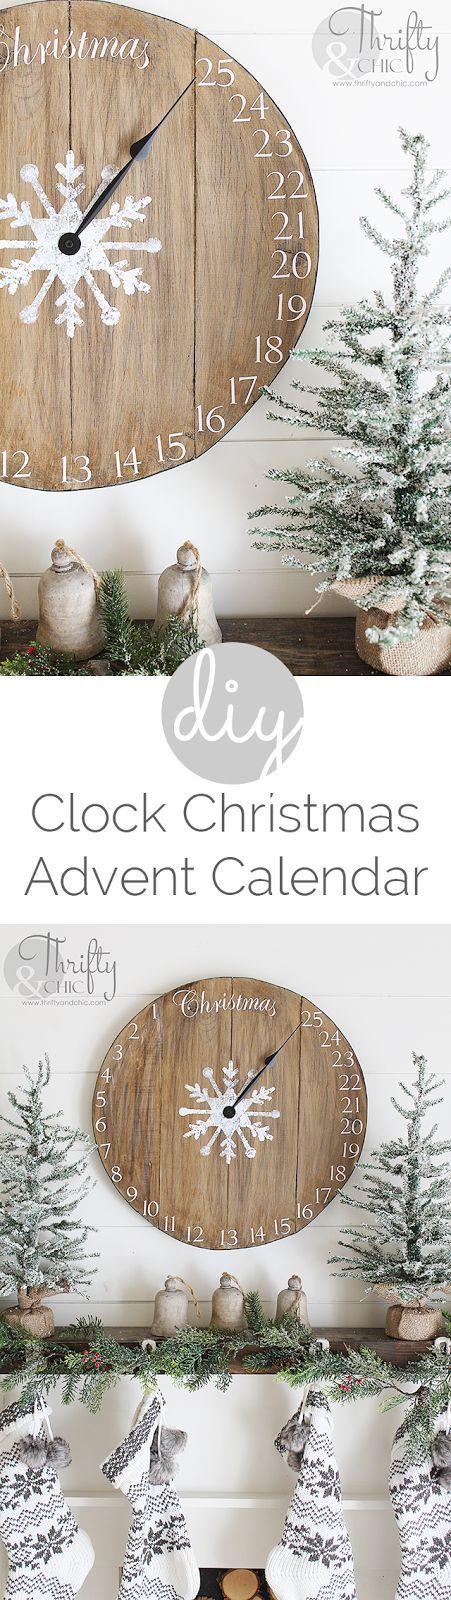 Christmas DIY: Clock Advent Calendar #christmasdecor #christmasdiy #christmascrafting